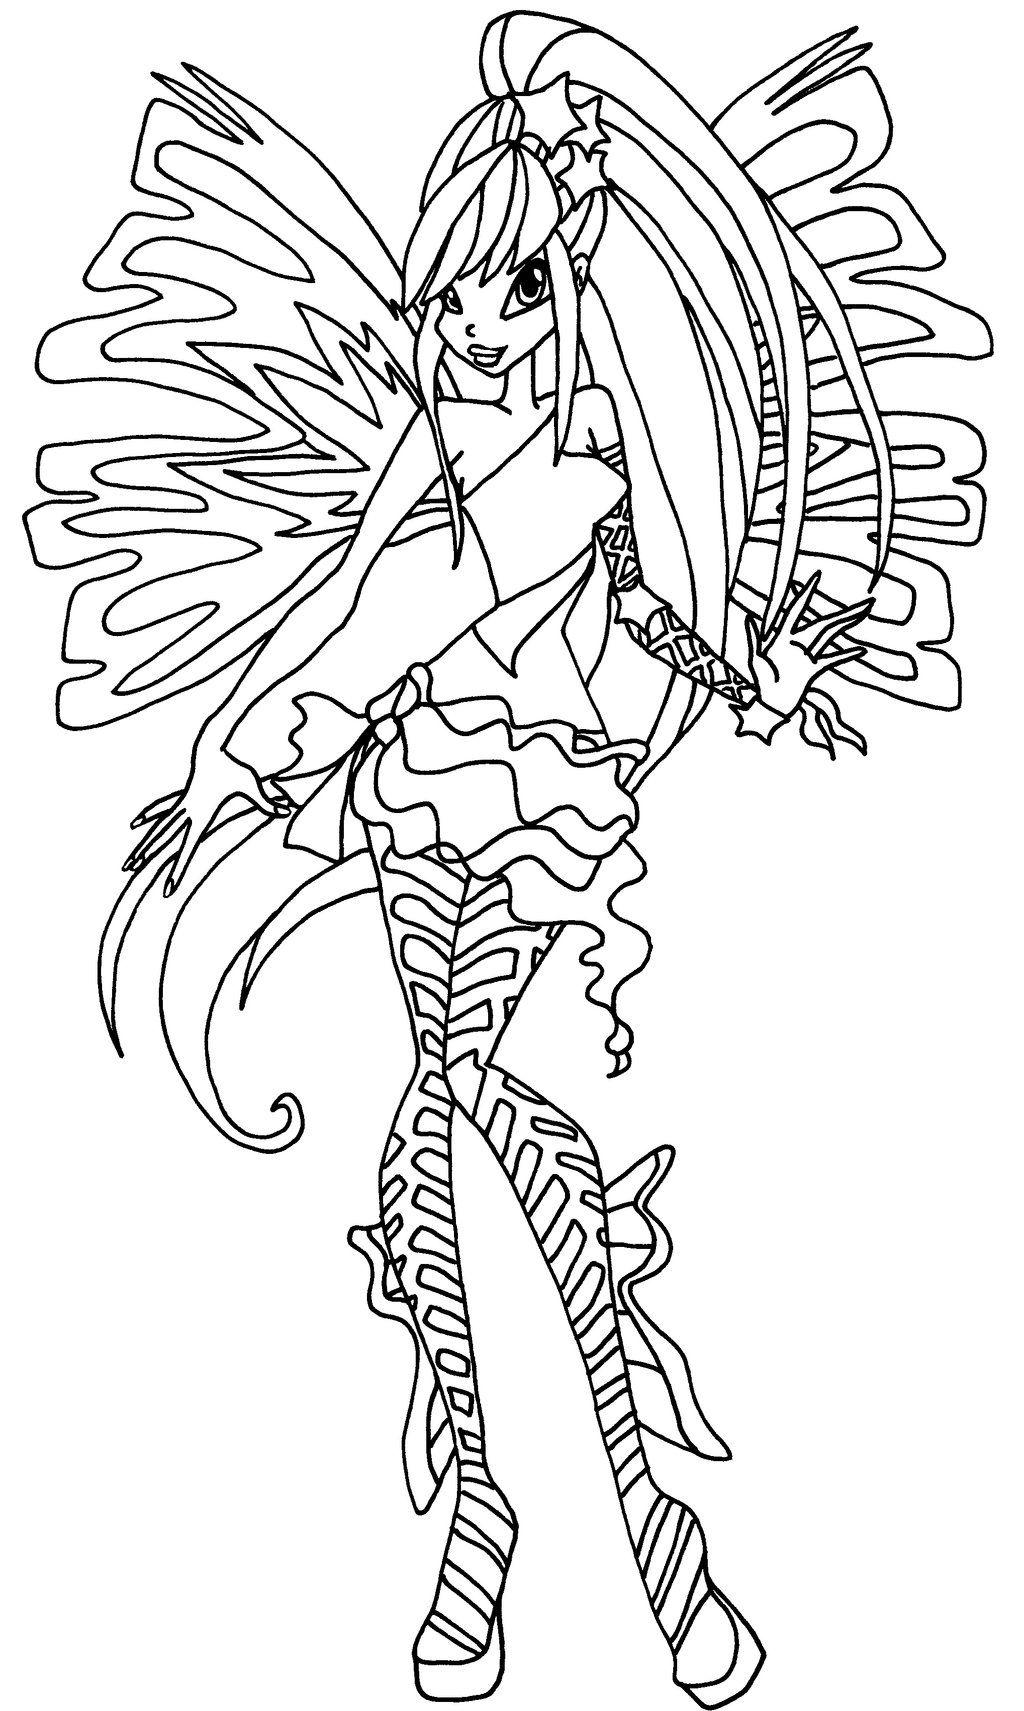 Sirenix Stella By Elfkena On Deviantart Princess Coloring Pages Cartoon Coloring Pages Princess Coloring